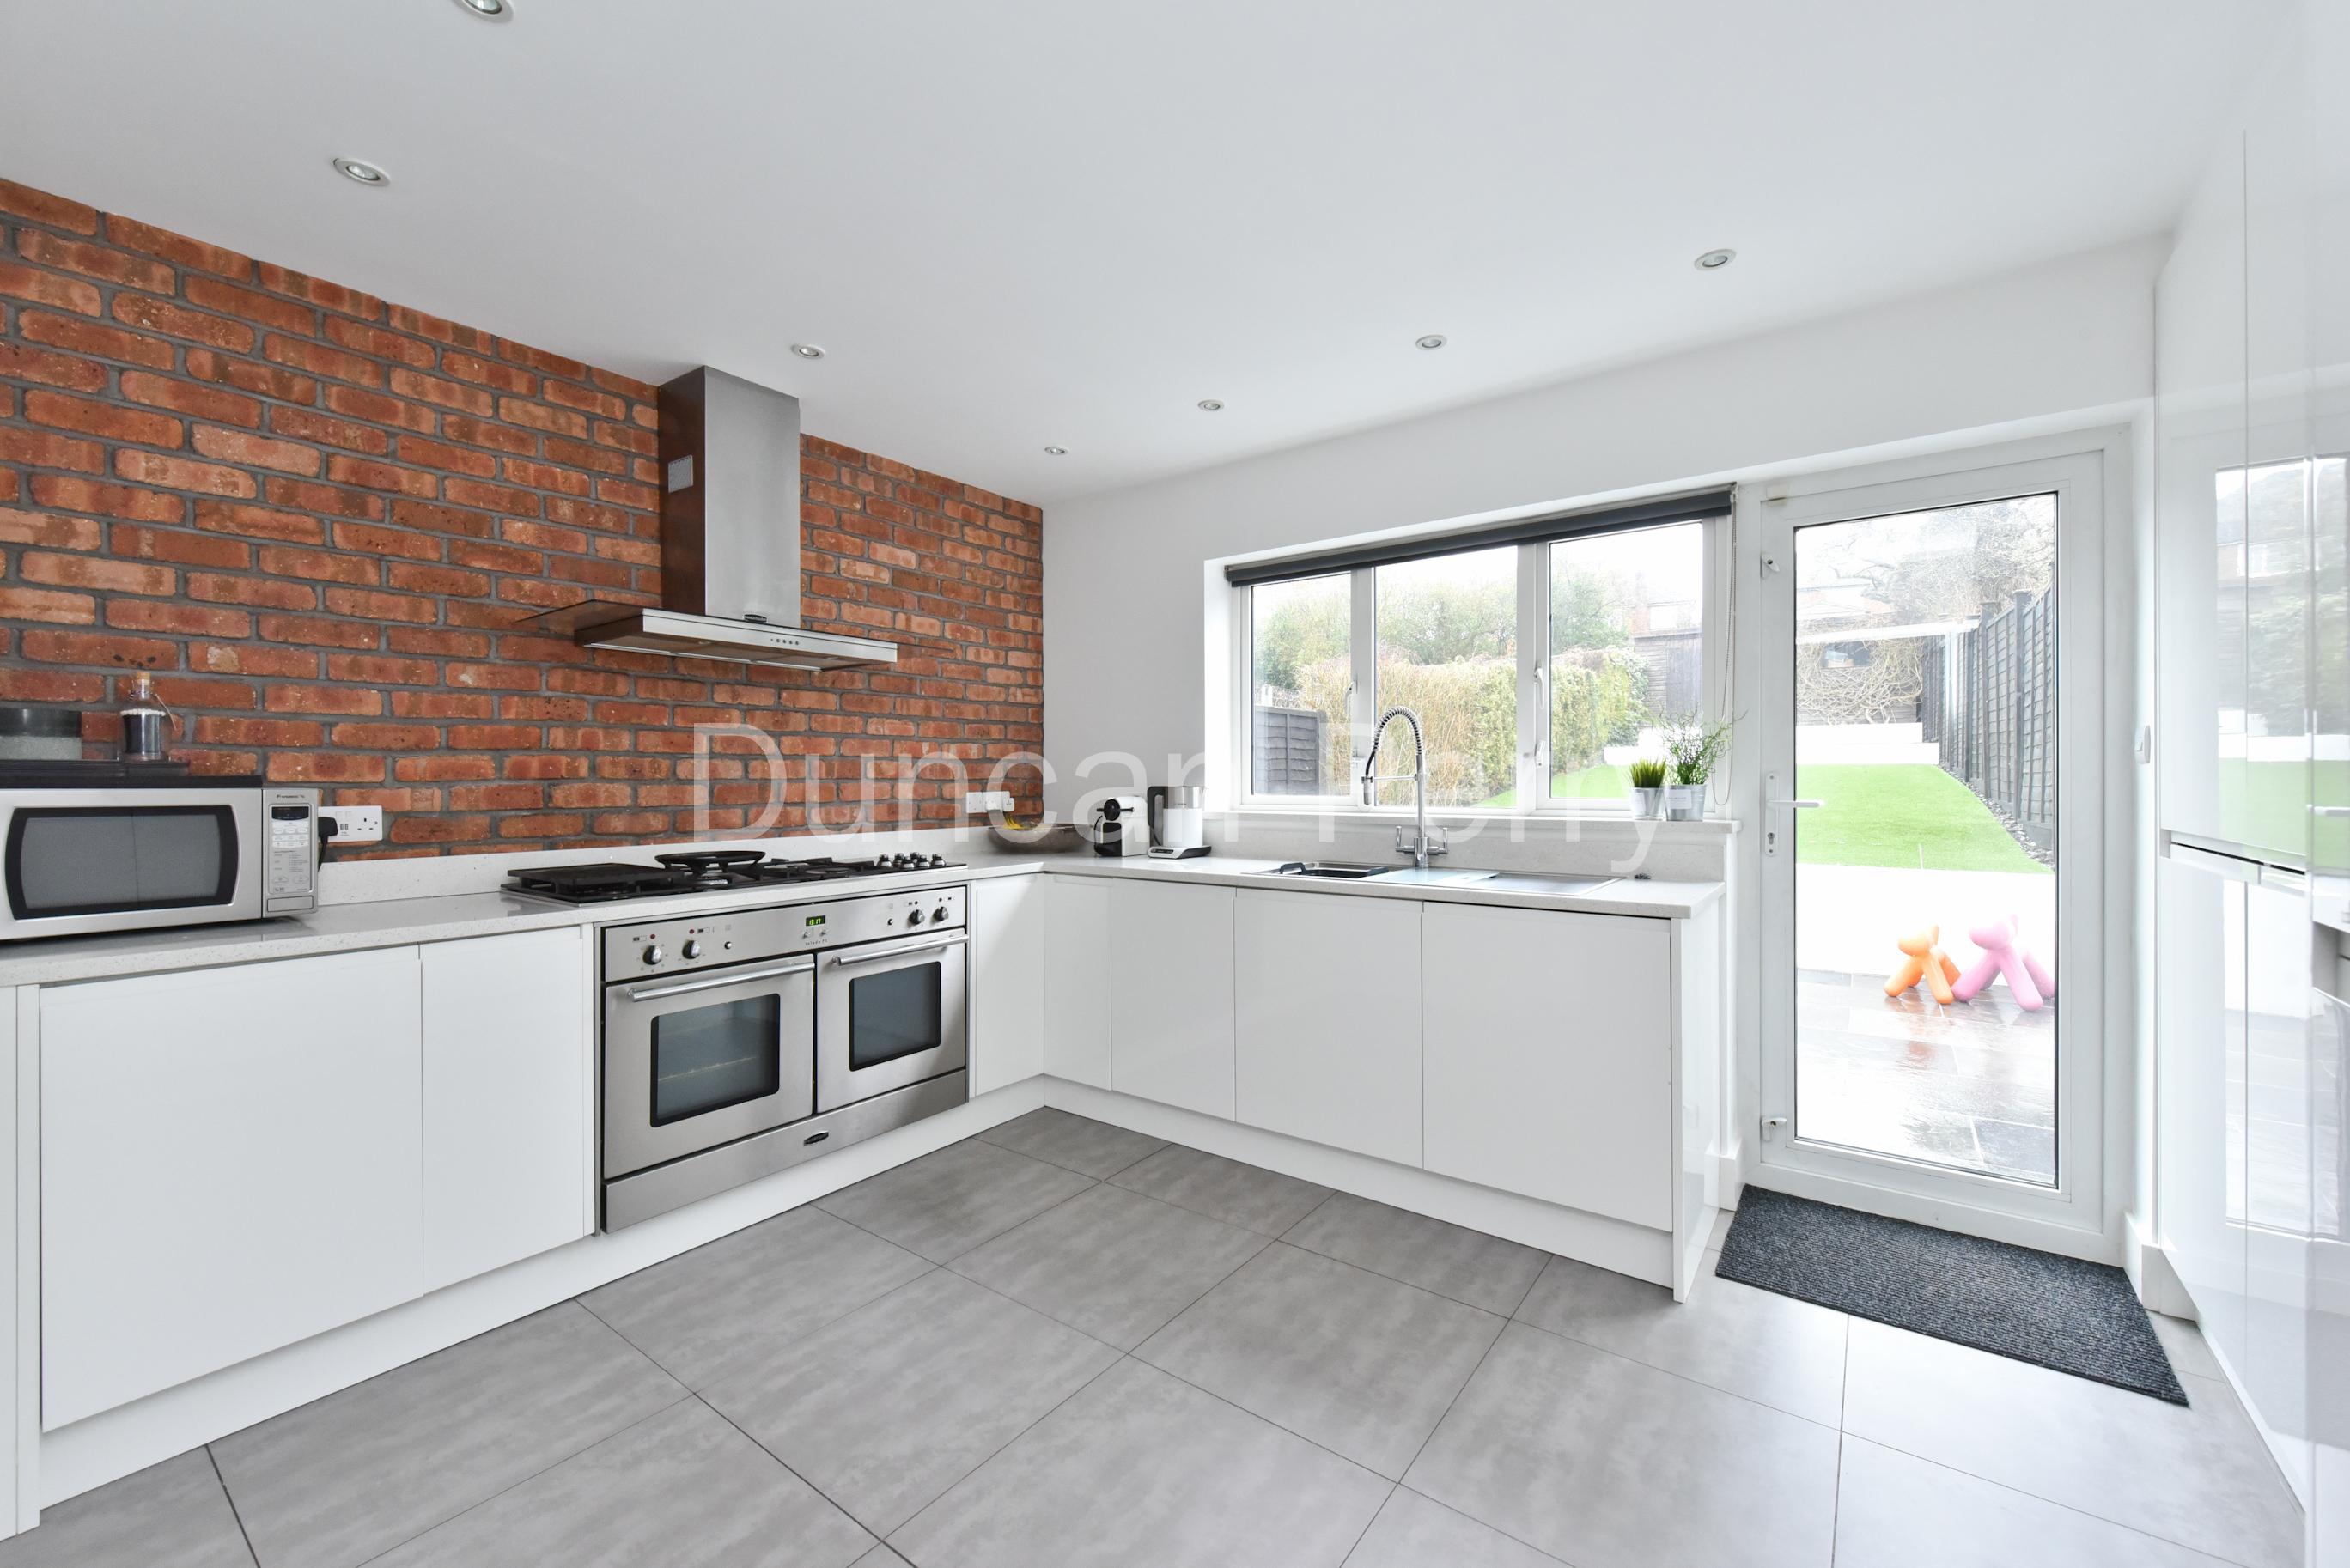 3 bedroom semi-detached house for sale in Deepdene, Potters Bar EN6 ...